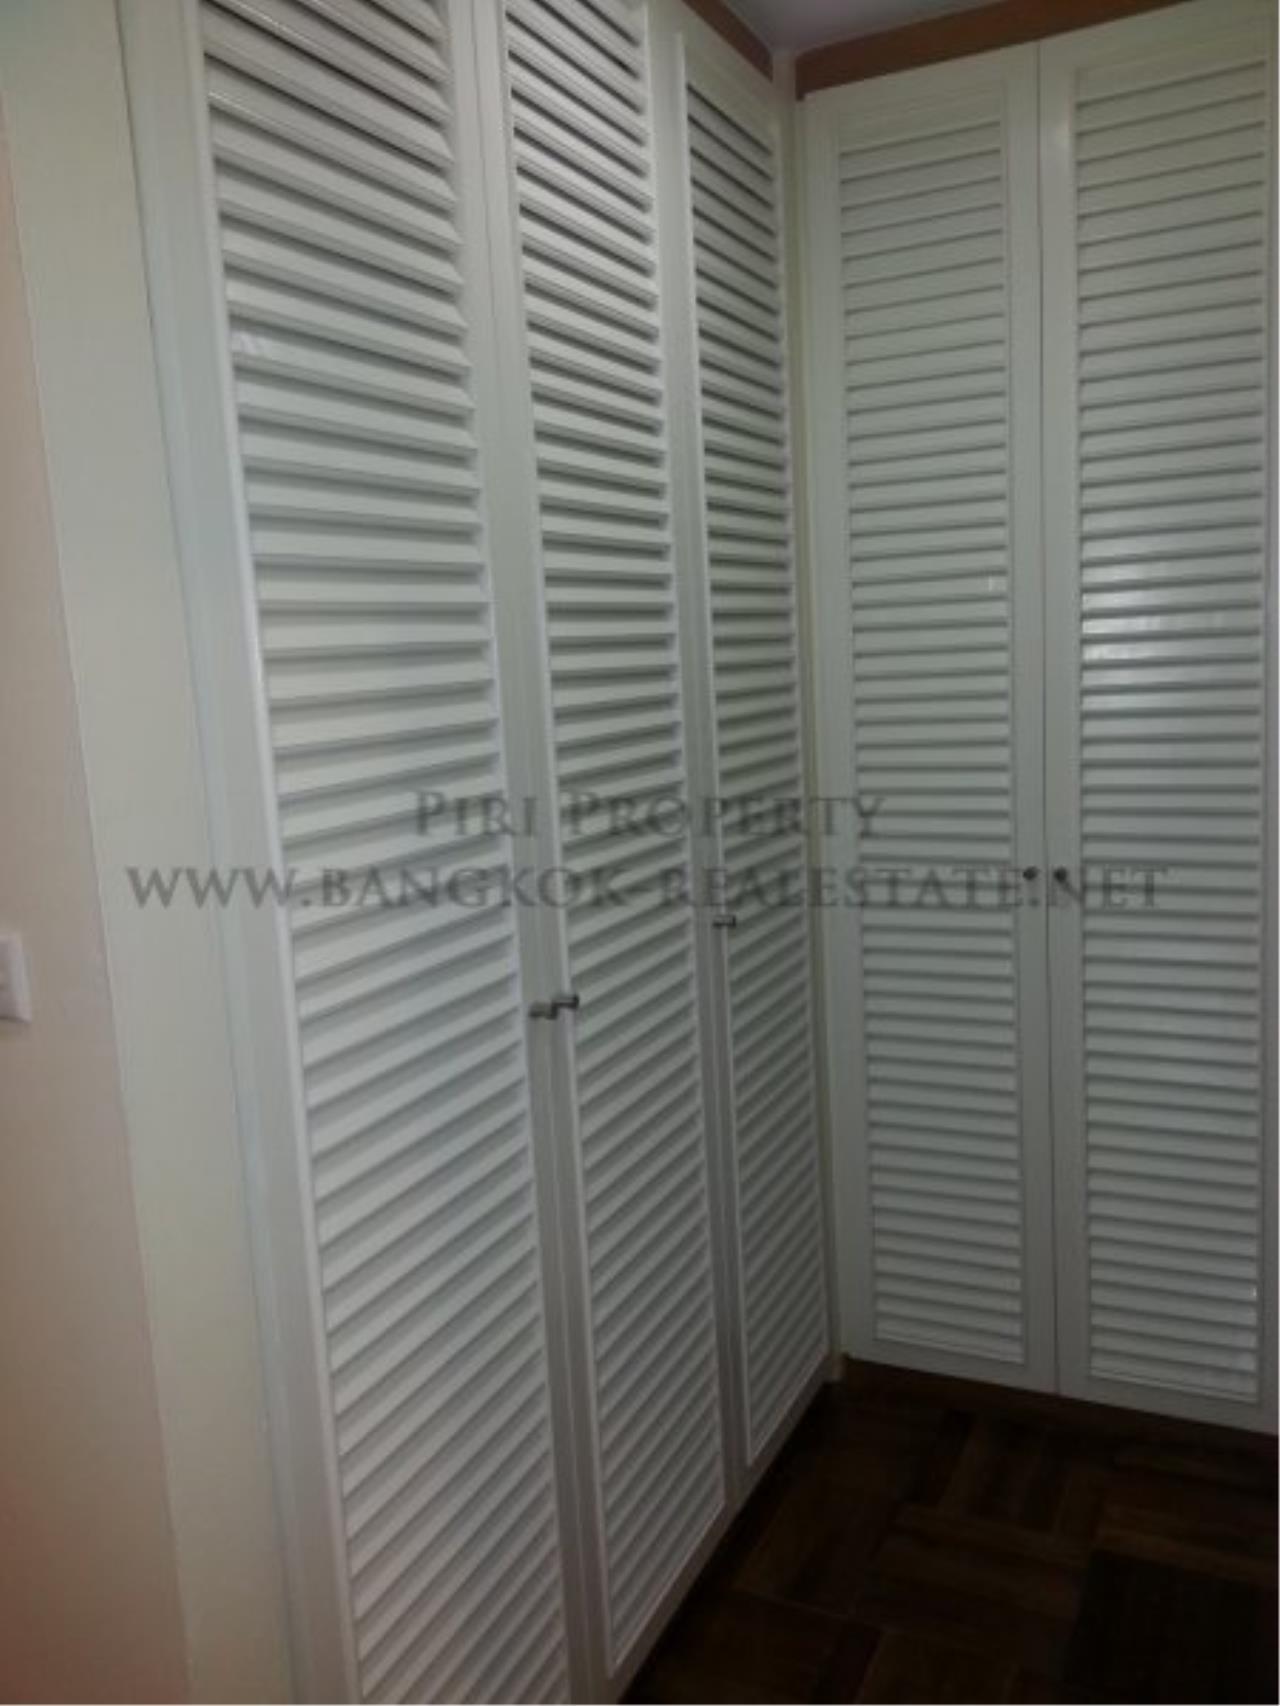 Piri Property Agency's Bangkok Garden - Spacious 2 Bedroom for 28K - Low Floor 9